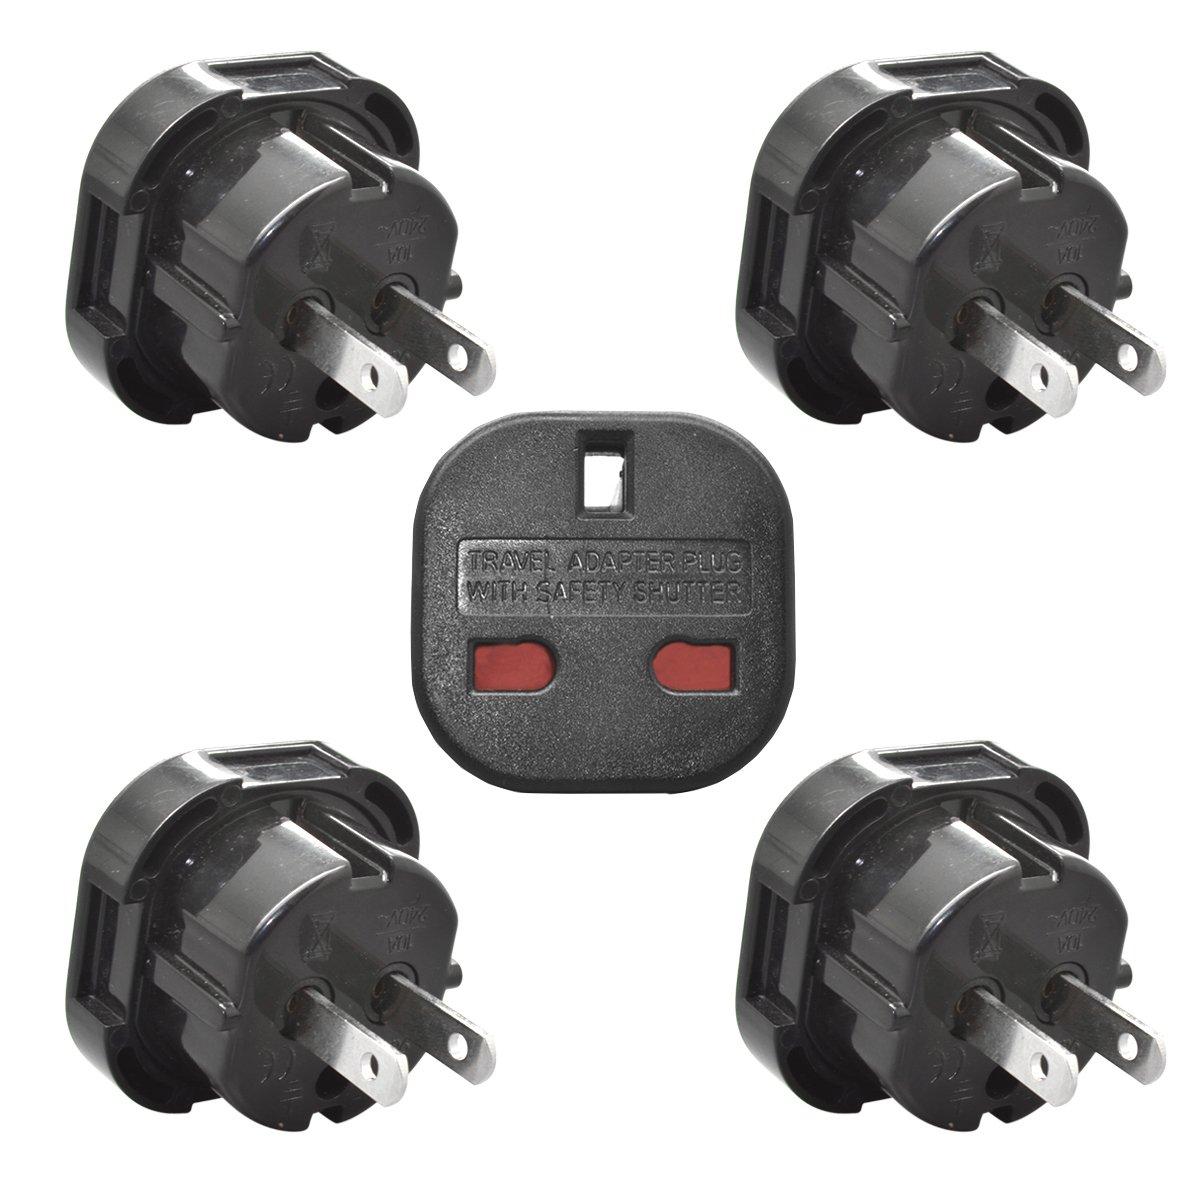 Yuadon UK British to US American Australia Newzealand Travel Power Adapter Plug-Black,Pack of 5